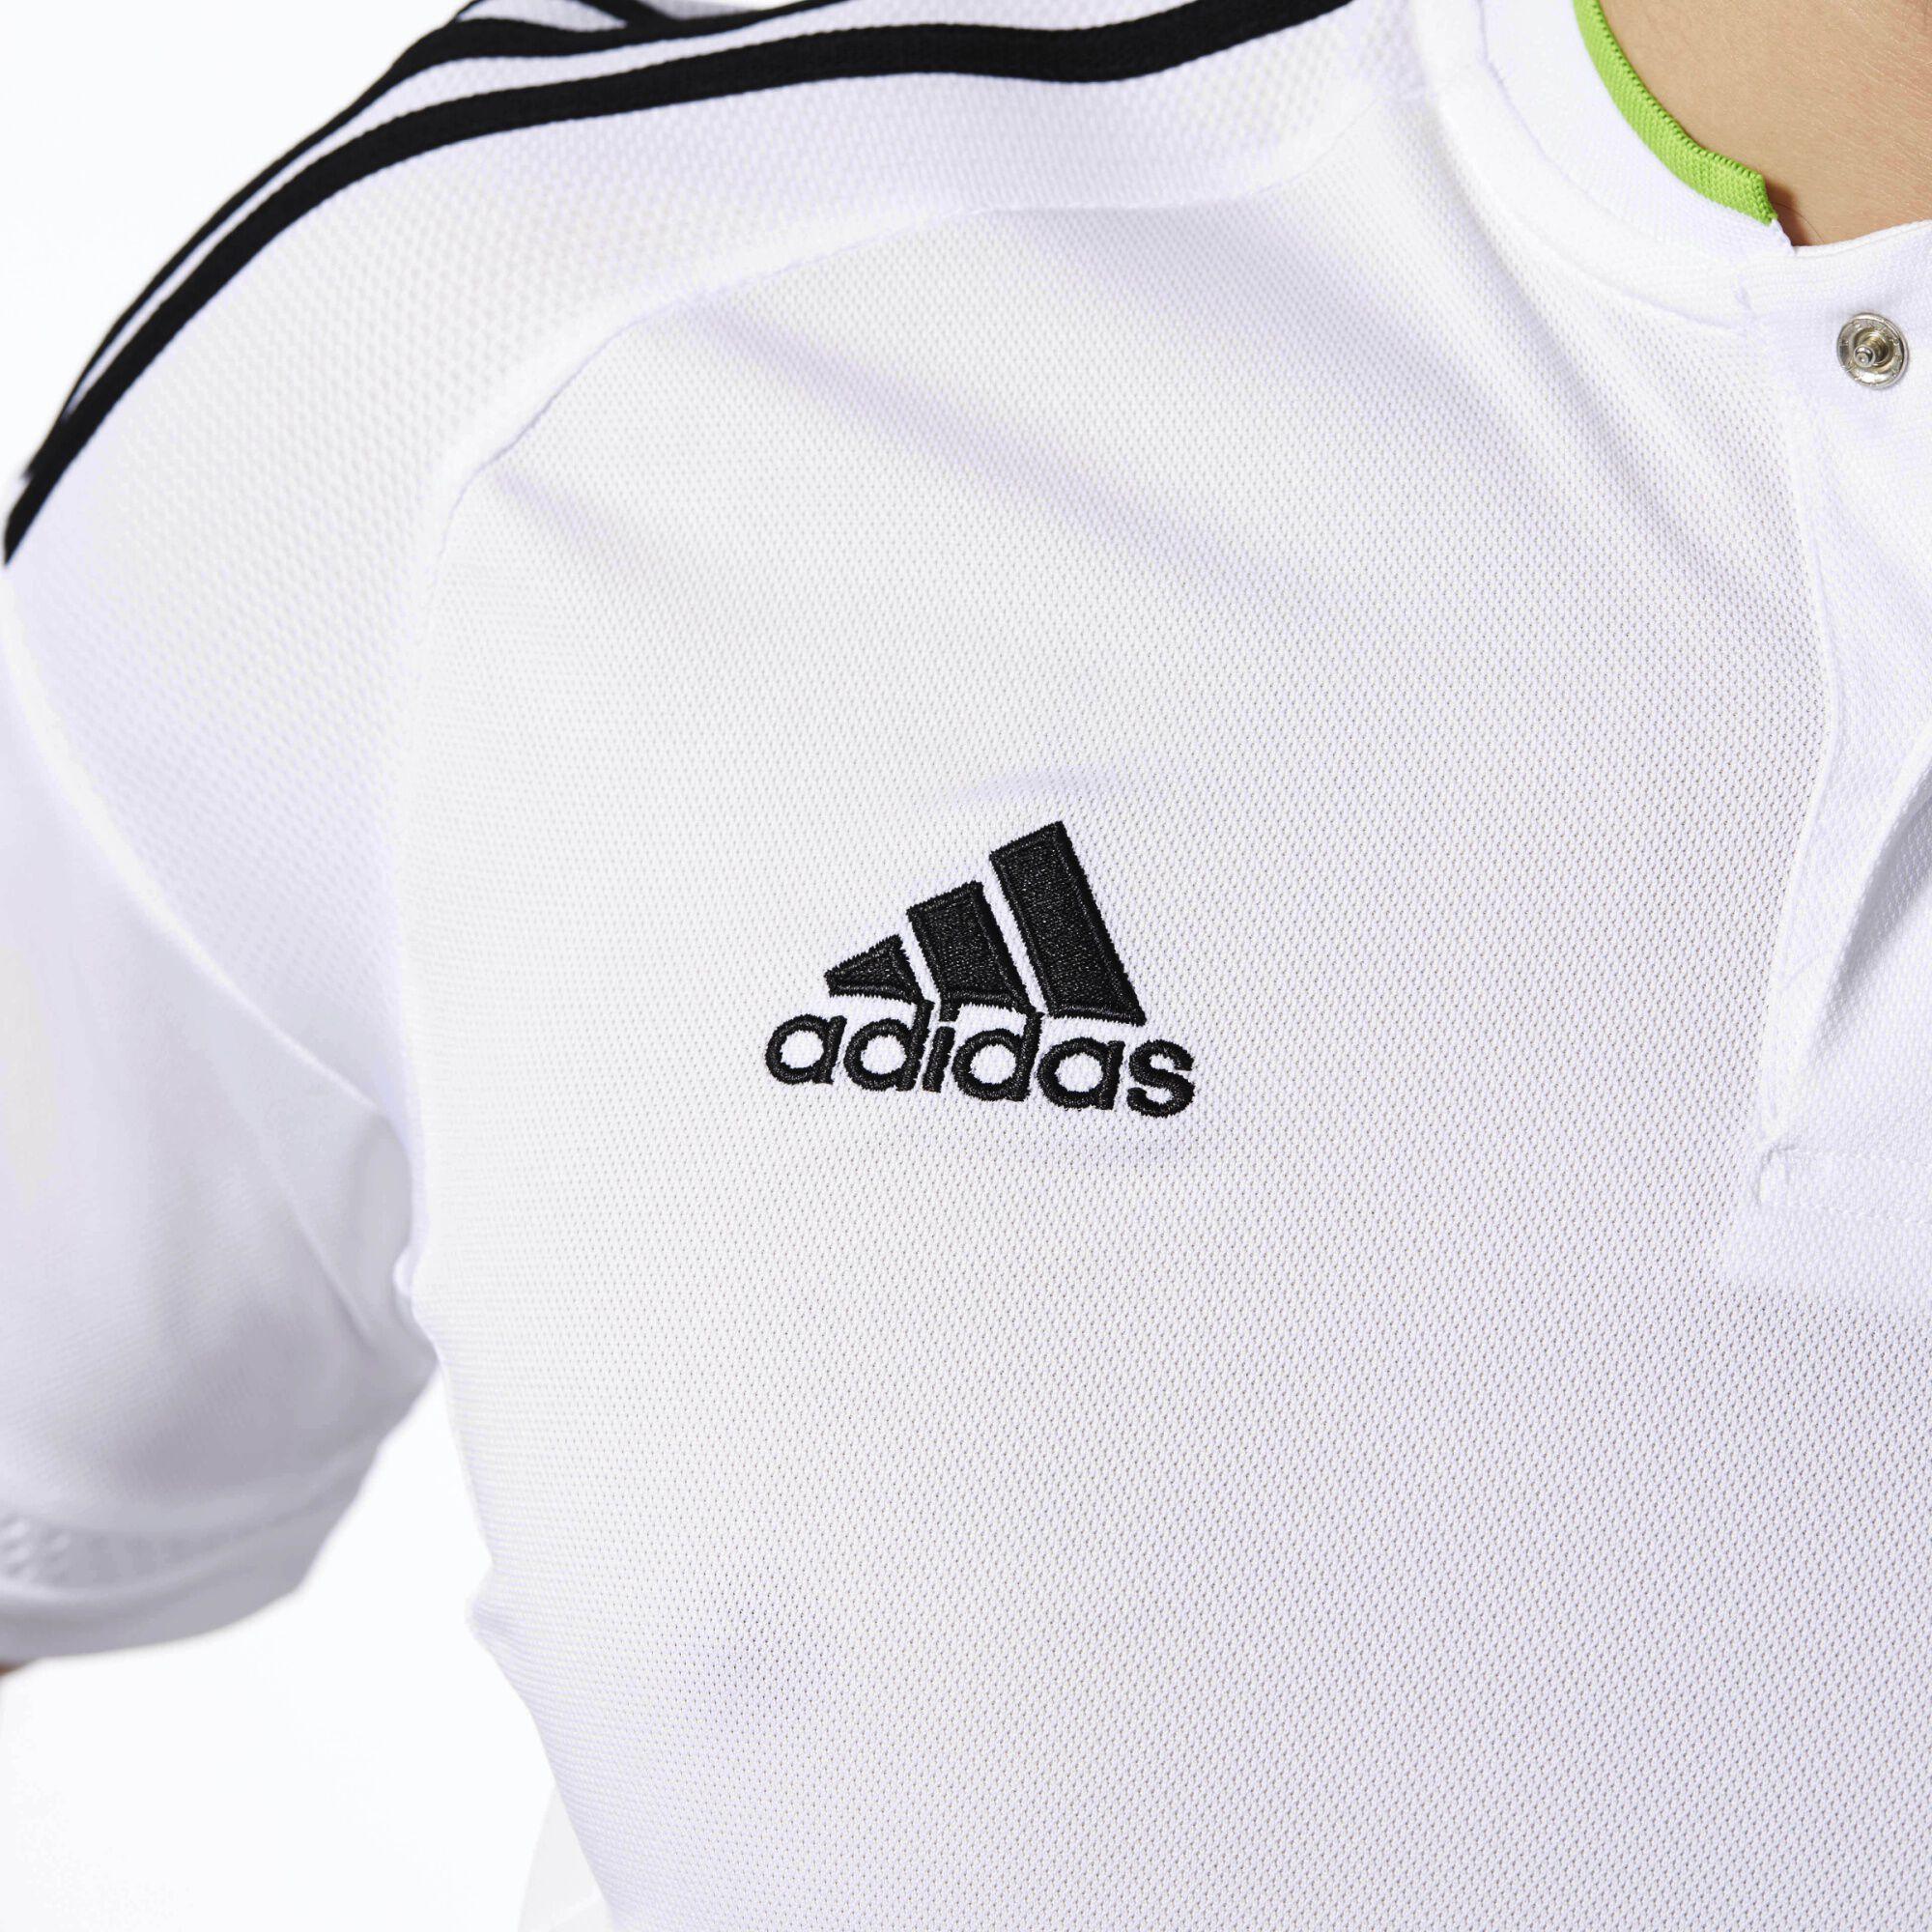 new arrivals 1f2f6 75c99 Adidas Originals Tubular Doom Sock Sneakers Aw Bball